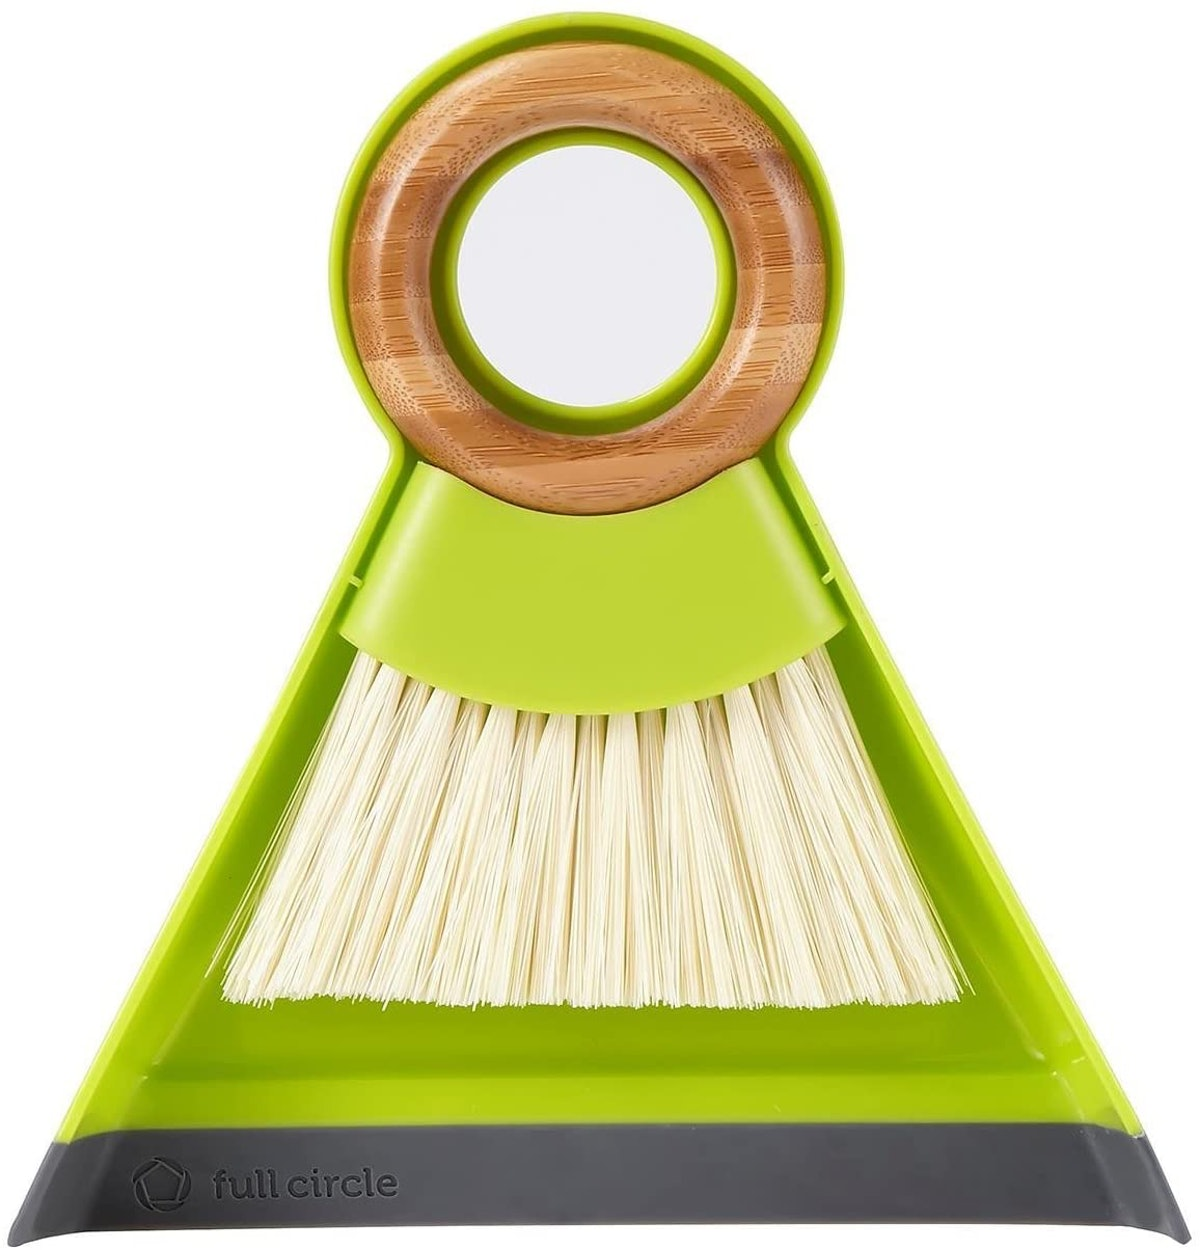 Full Circle Mini Brush and Dust Pan